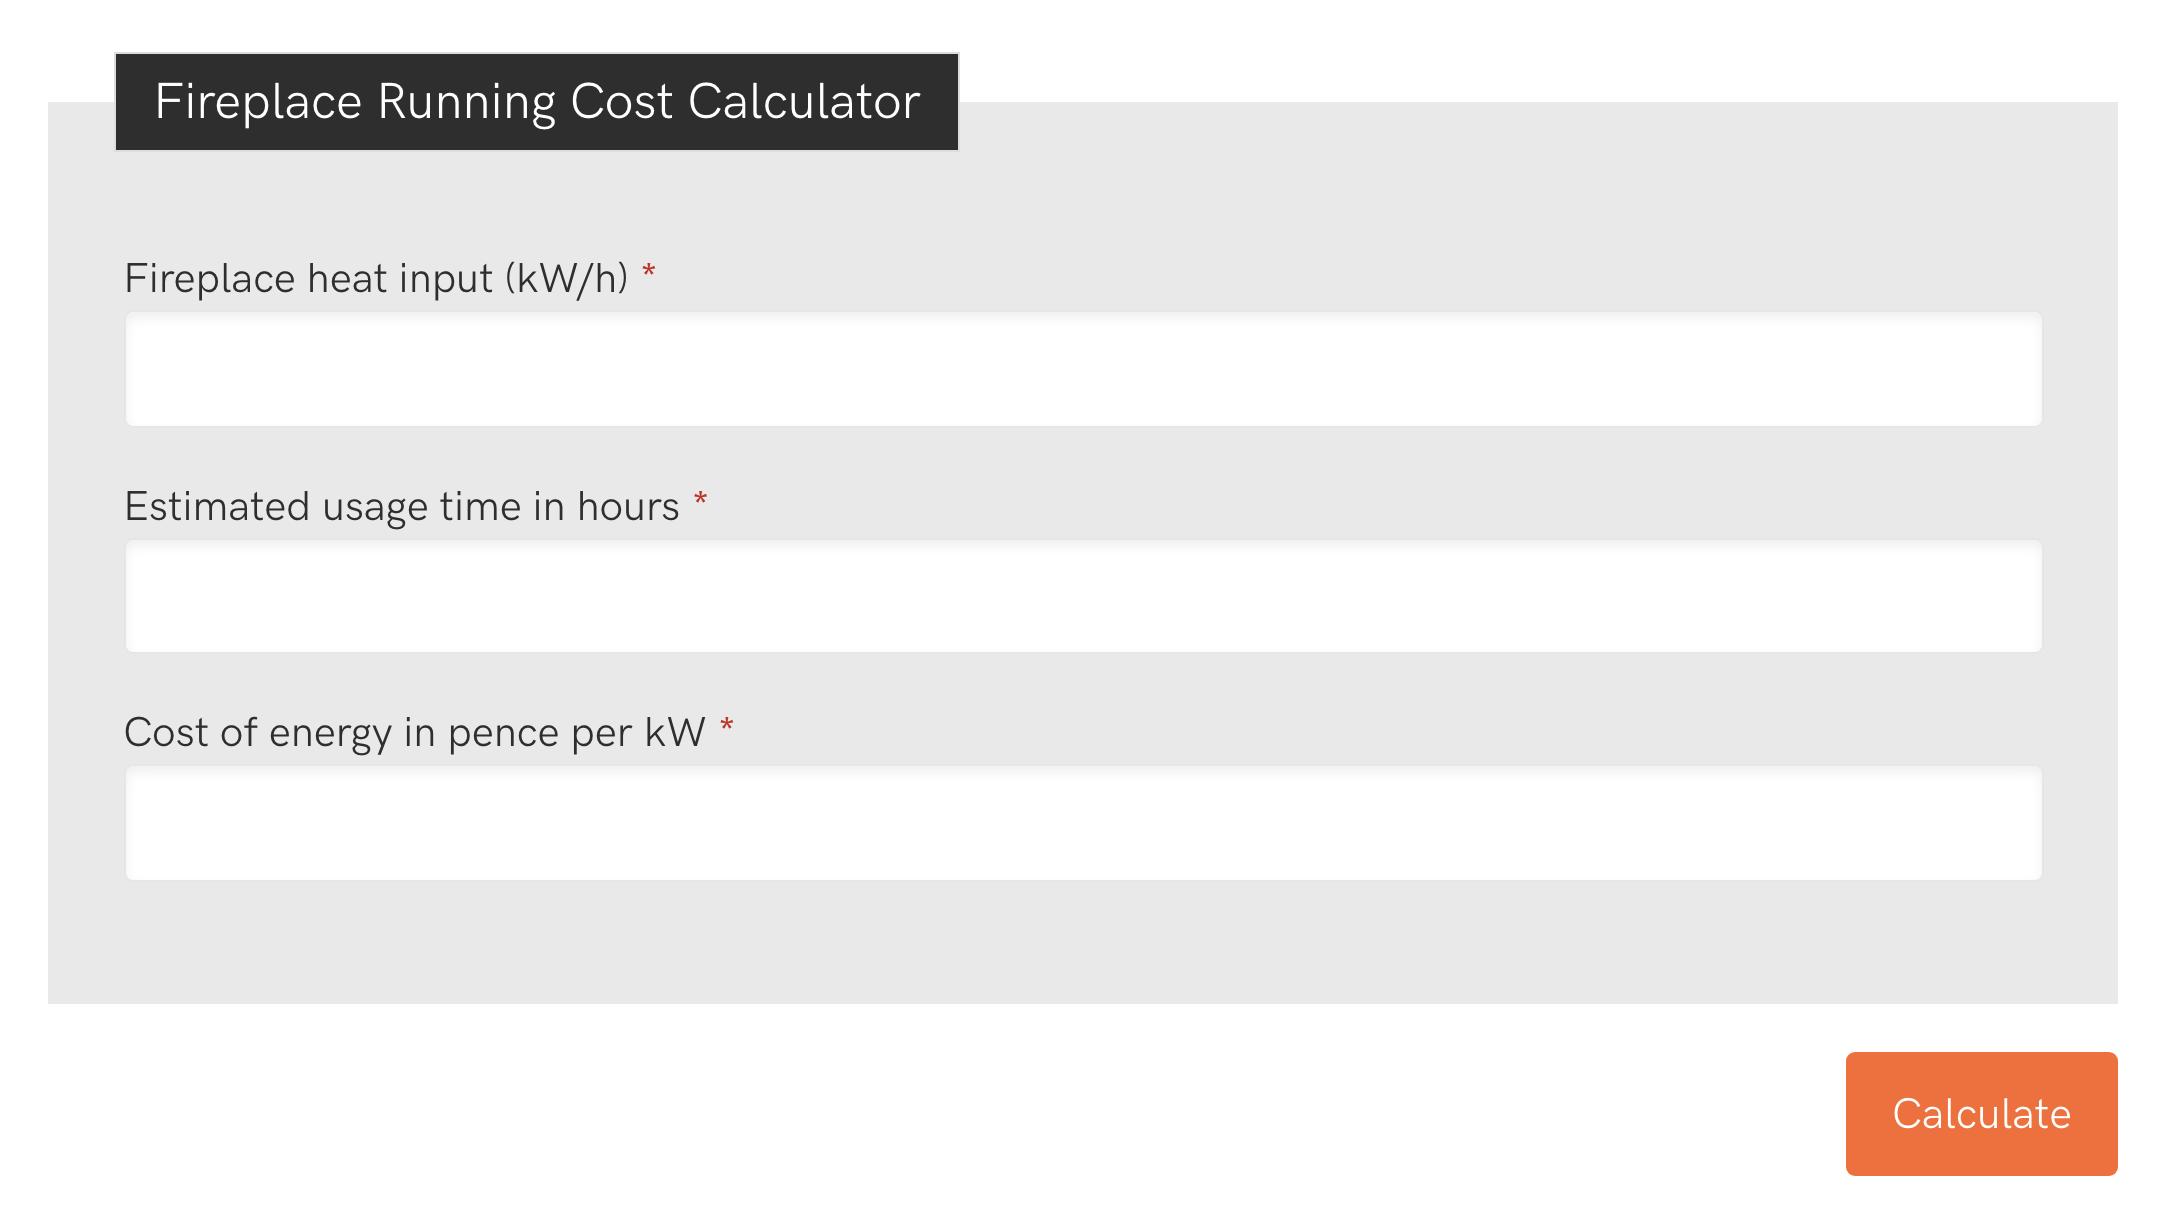 Fireplace Running Cost Calculator